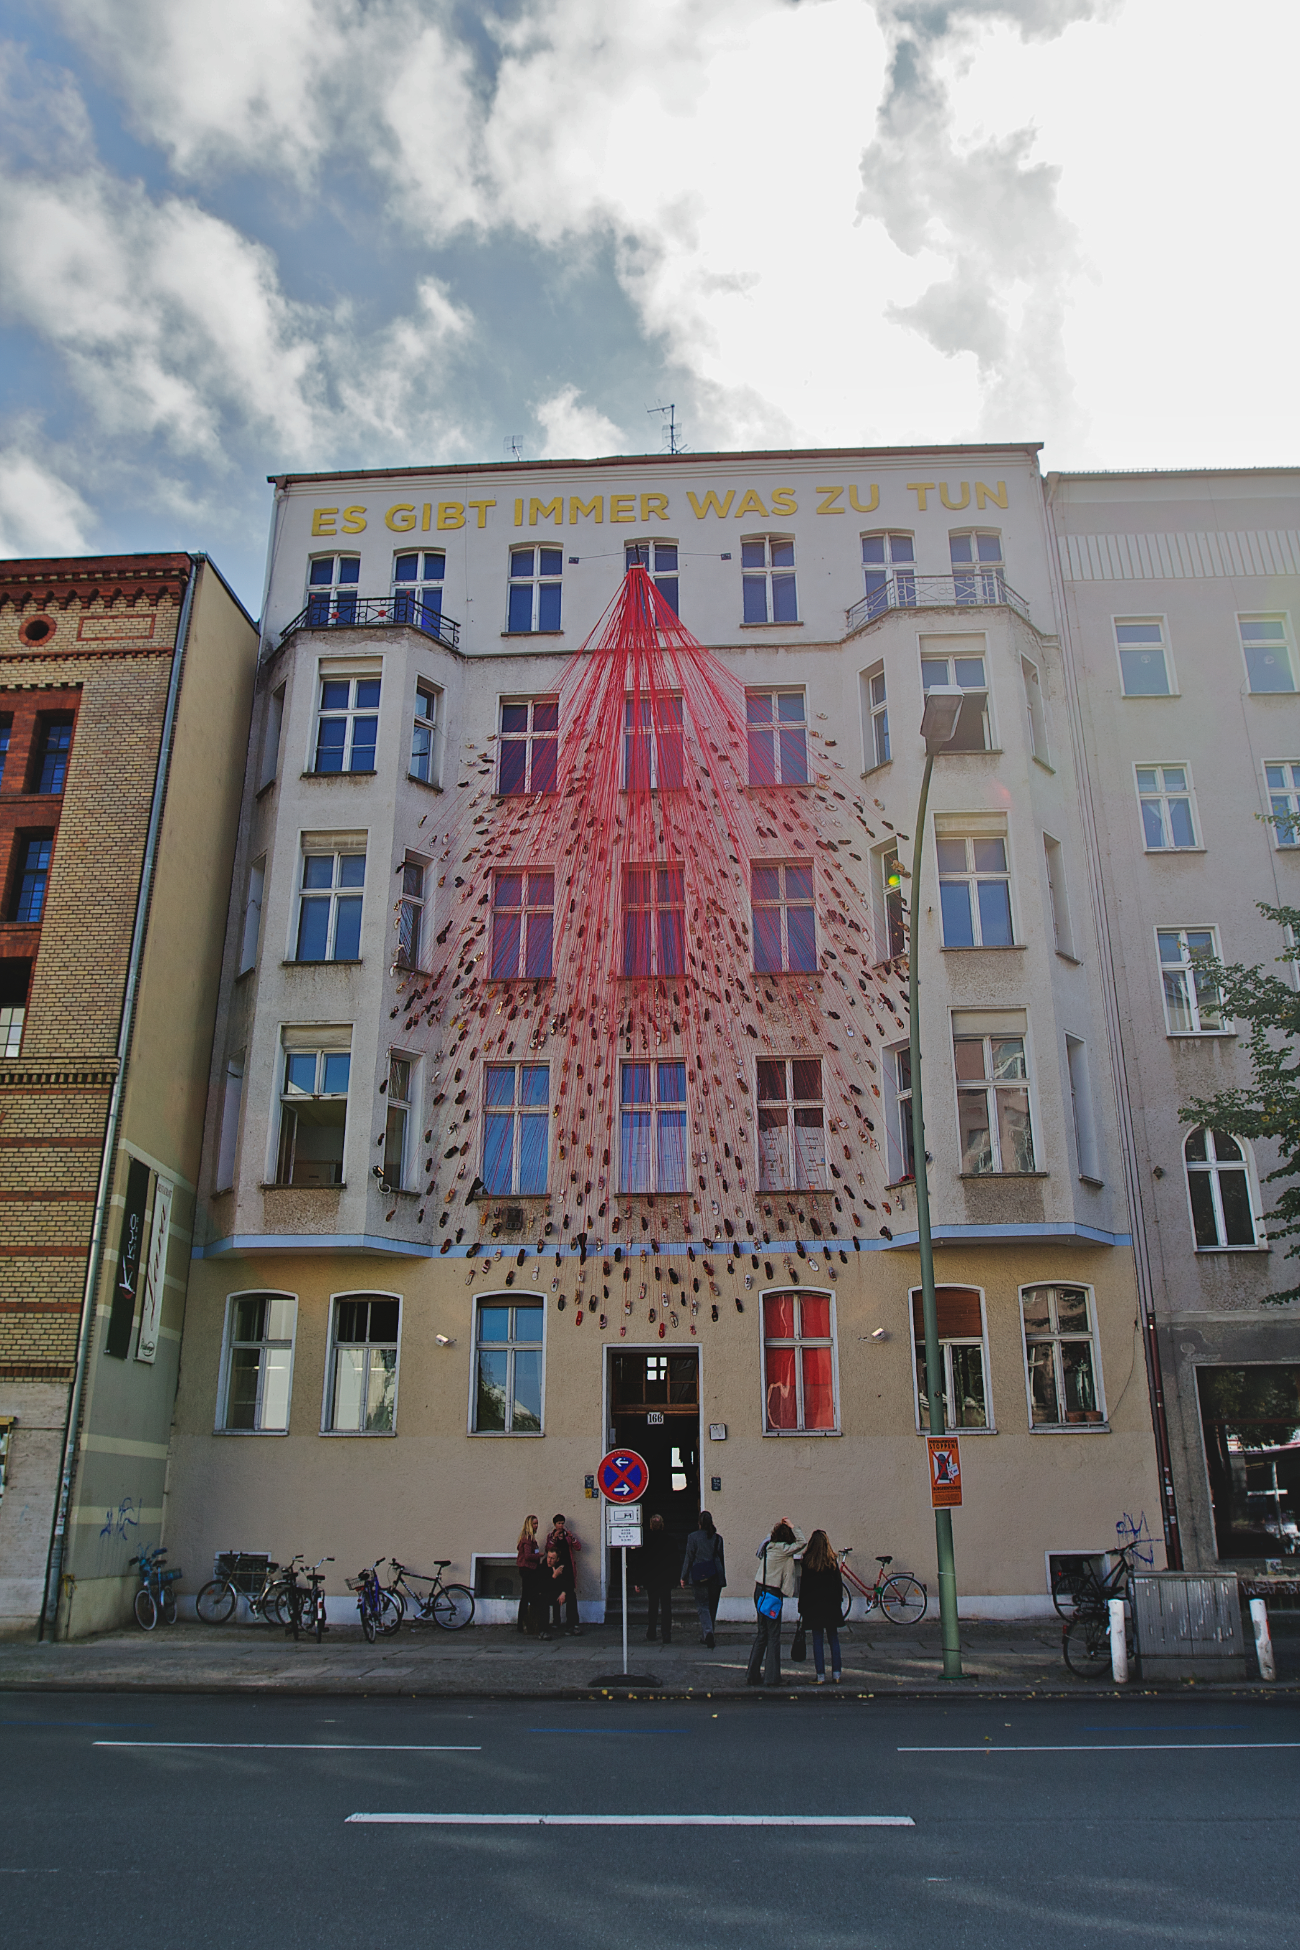 12008_Traces of Life_Torstrasse_Berlin_Photo Sunhi Mang_1.png